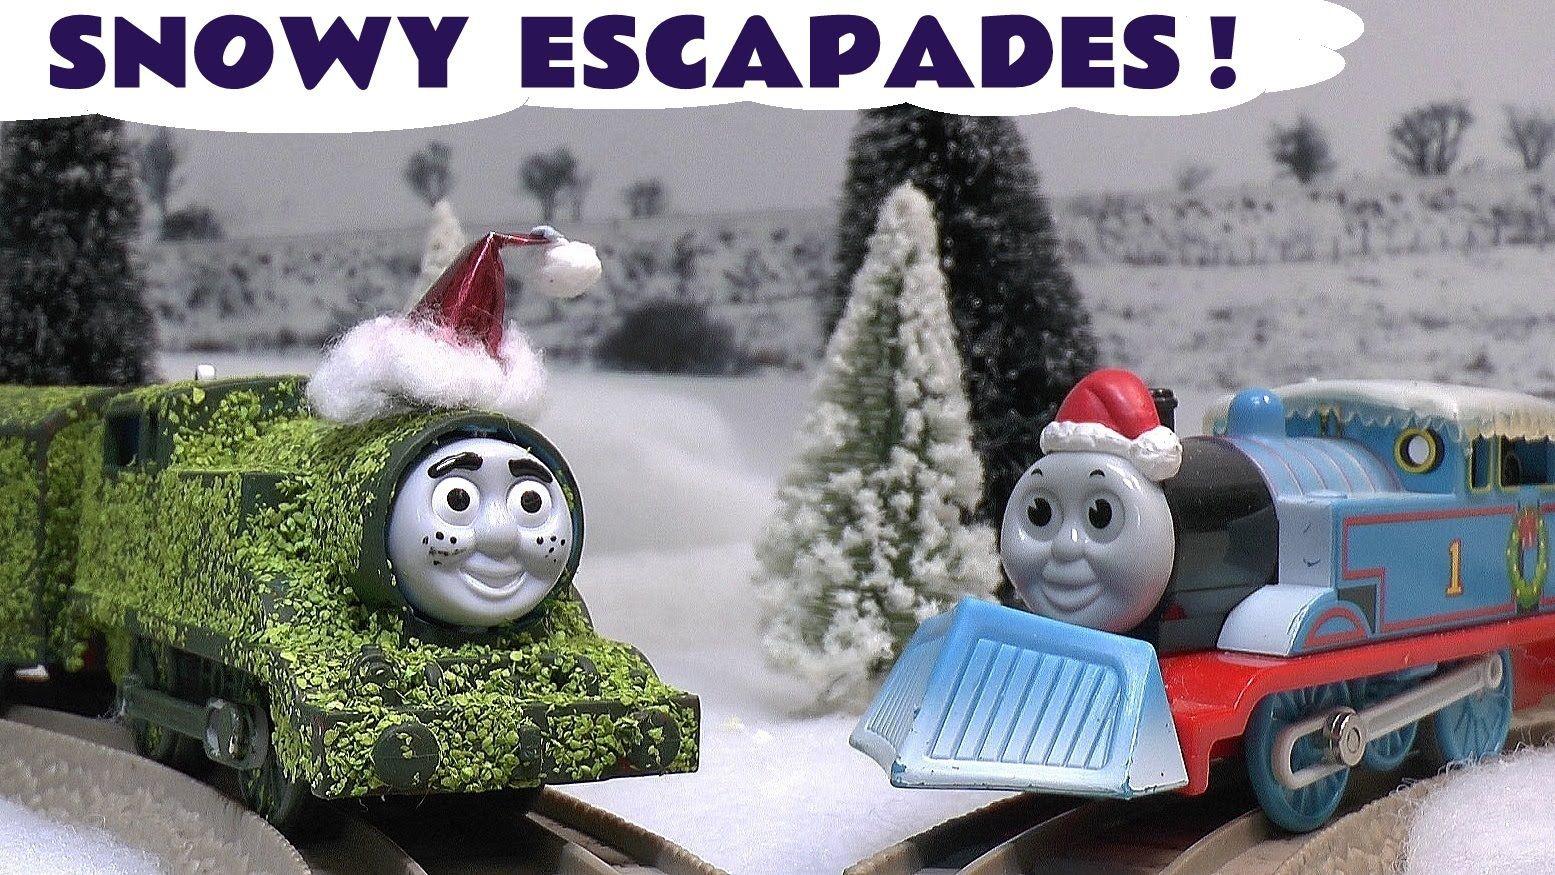 Thomas The Train Christmas.Thomas The Train Christmas Prank Toy Accident Story Carols